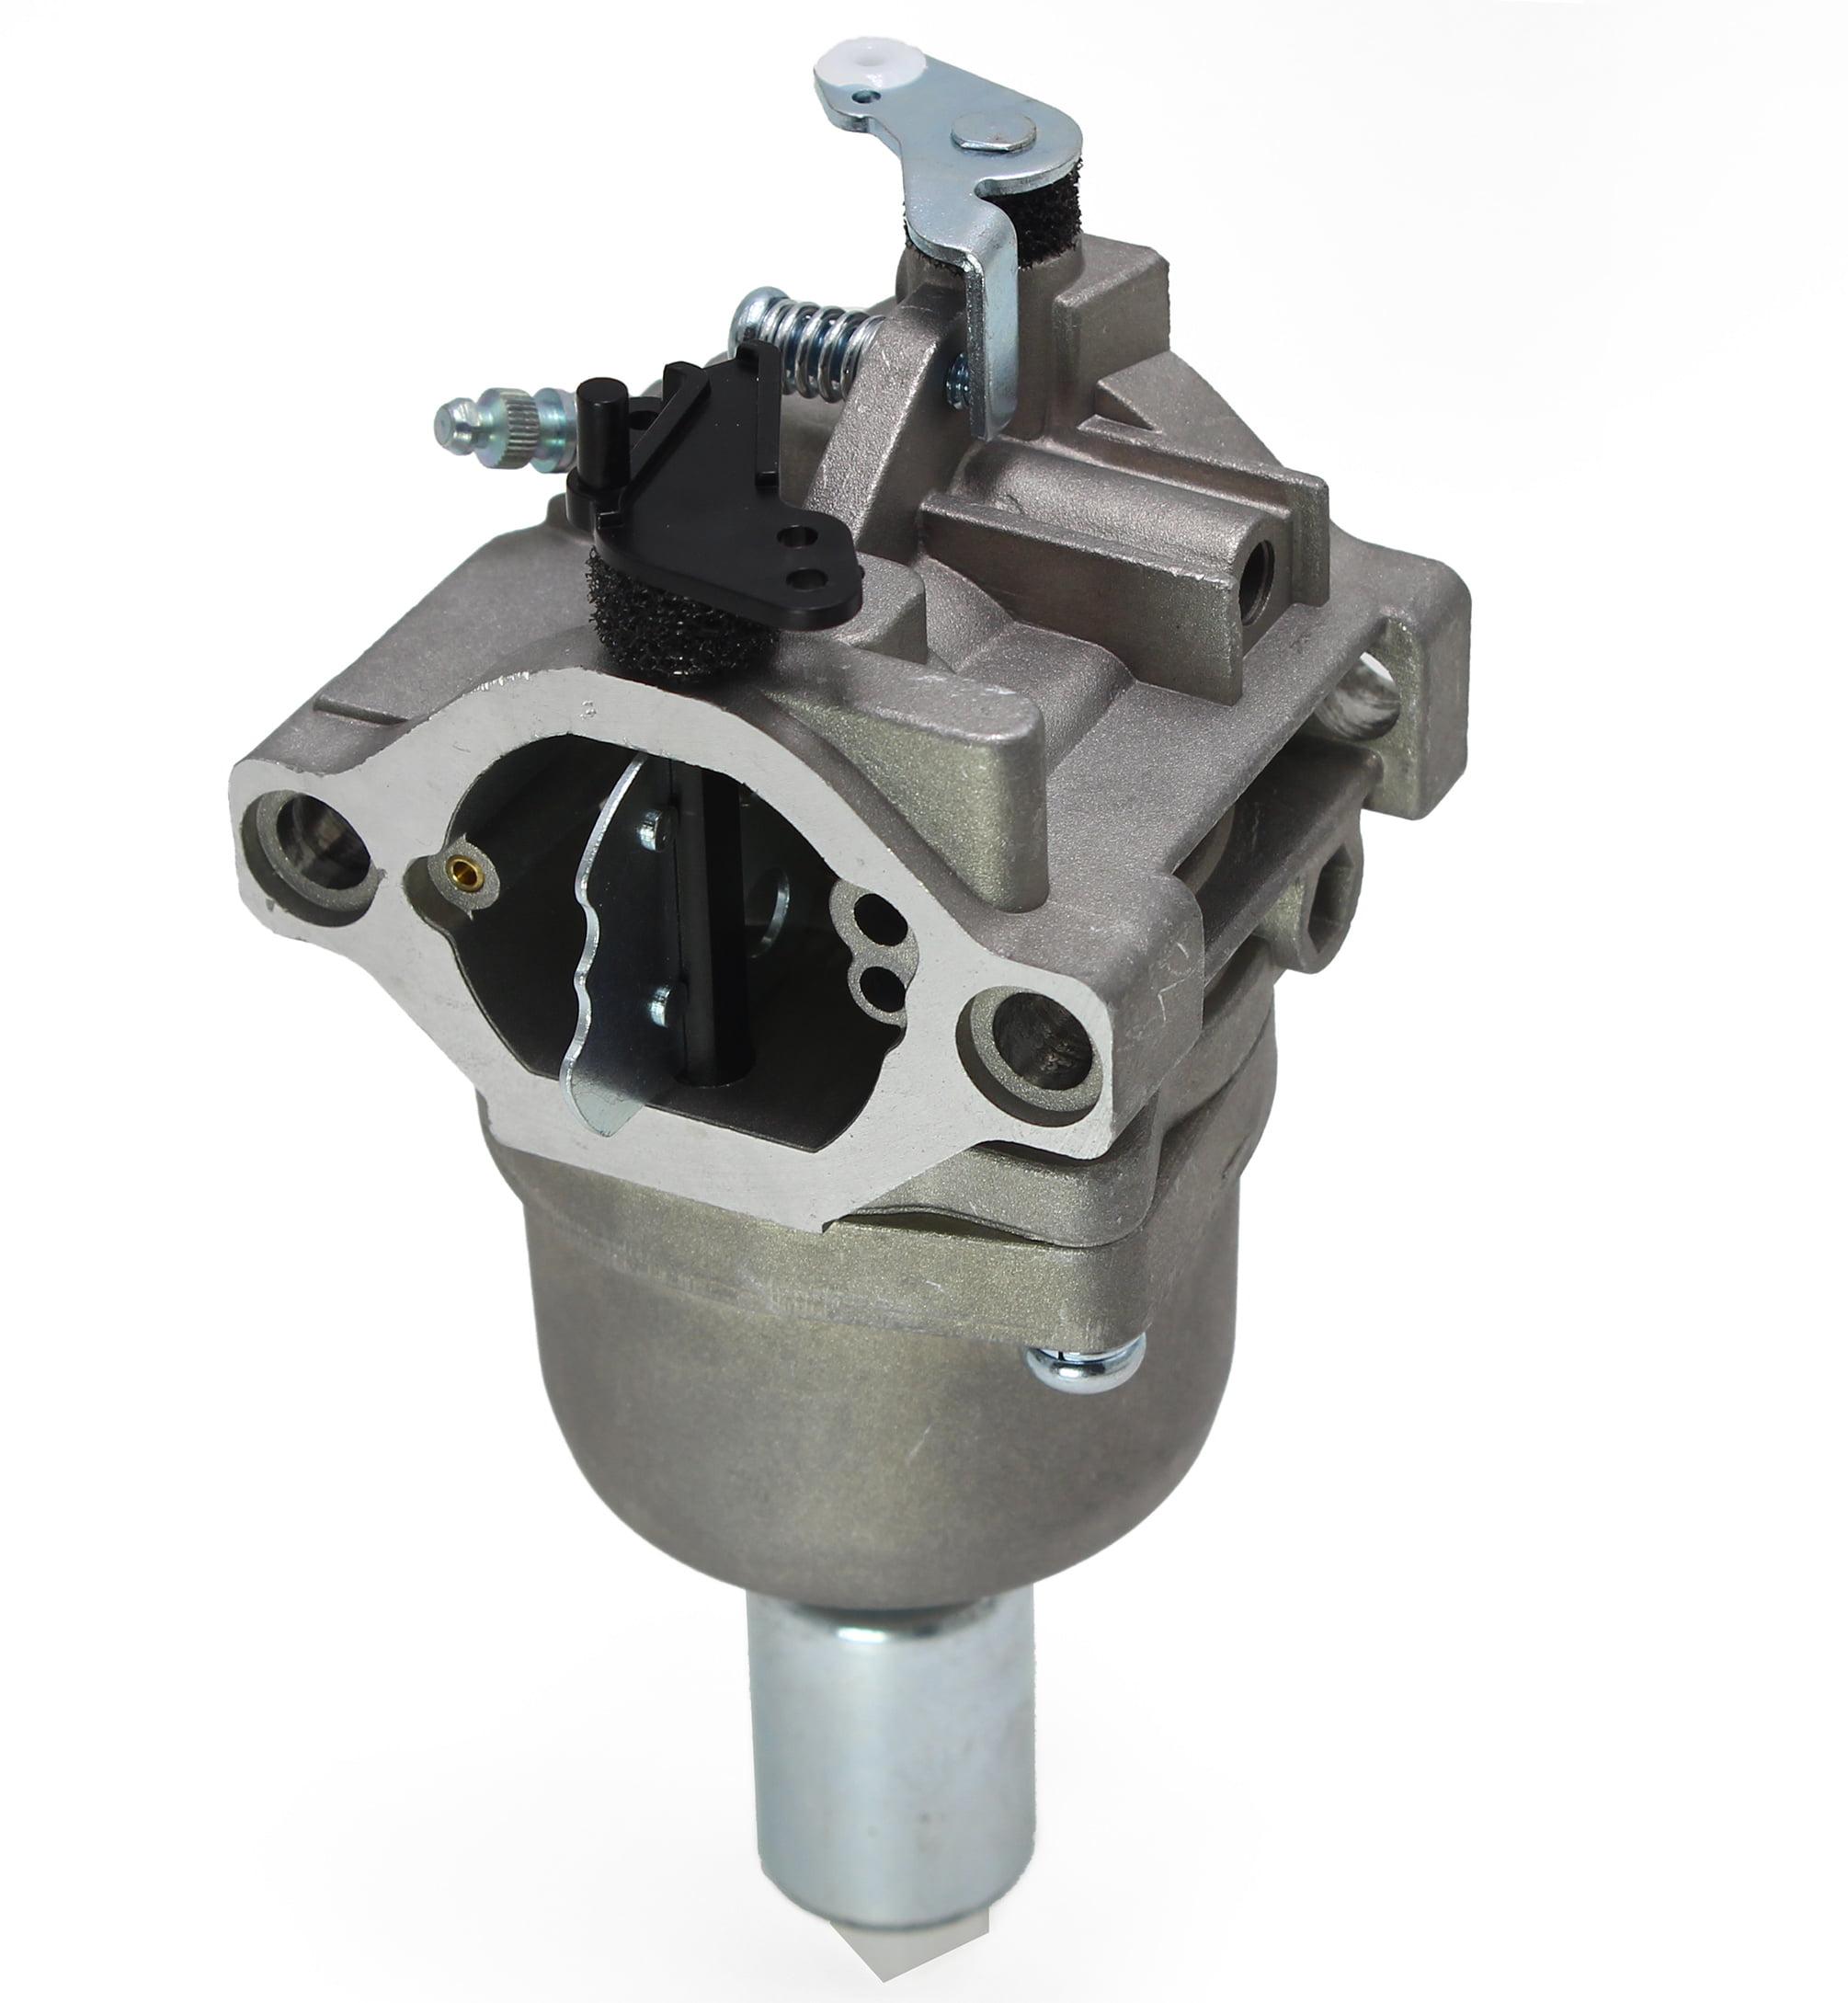 Carburetor For Craftsman LT1000 Briggs and Stratton 794572 793224 697141 697216